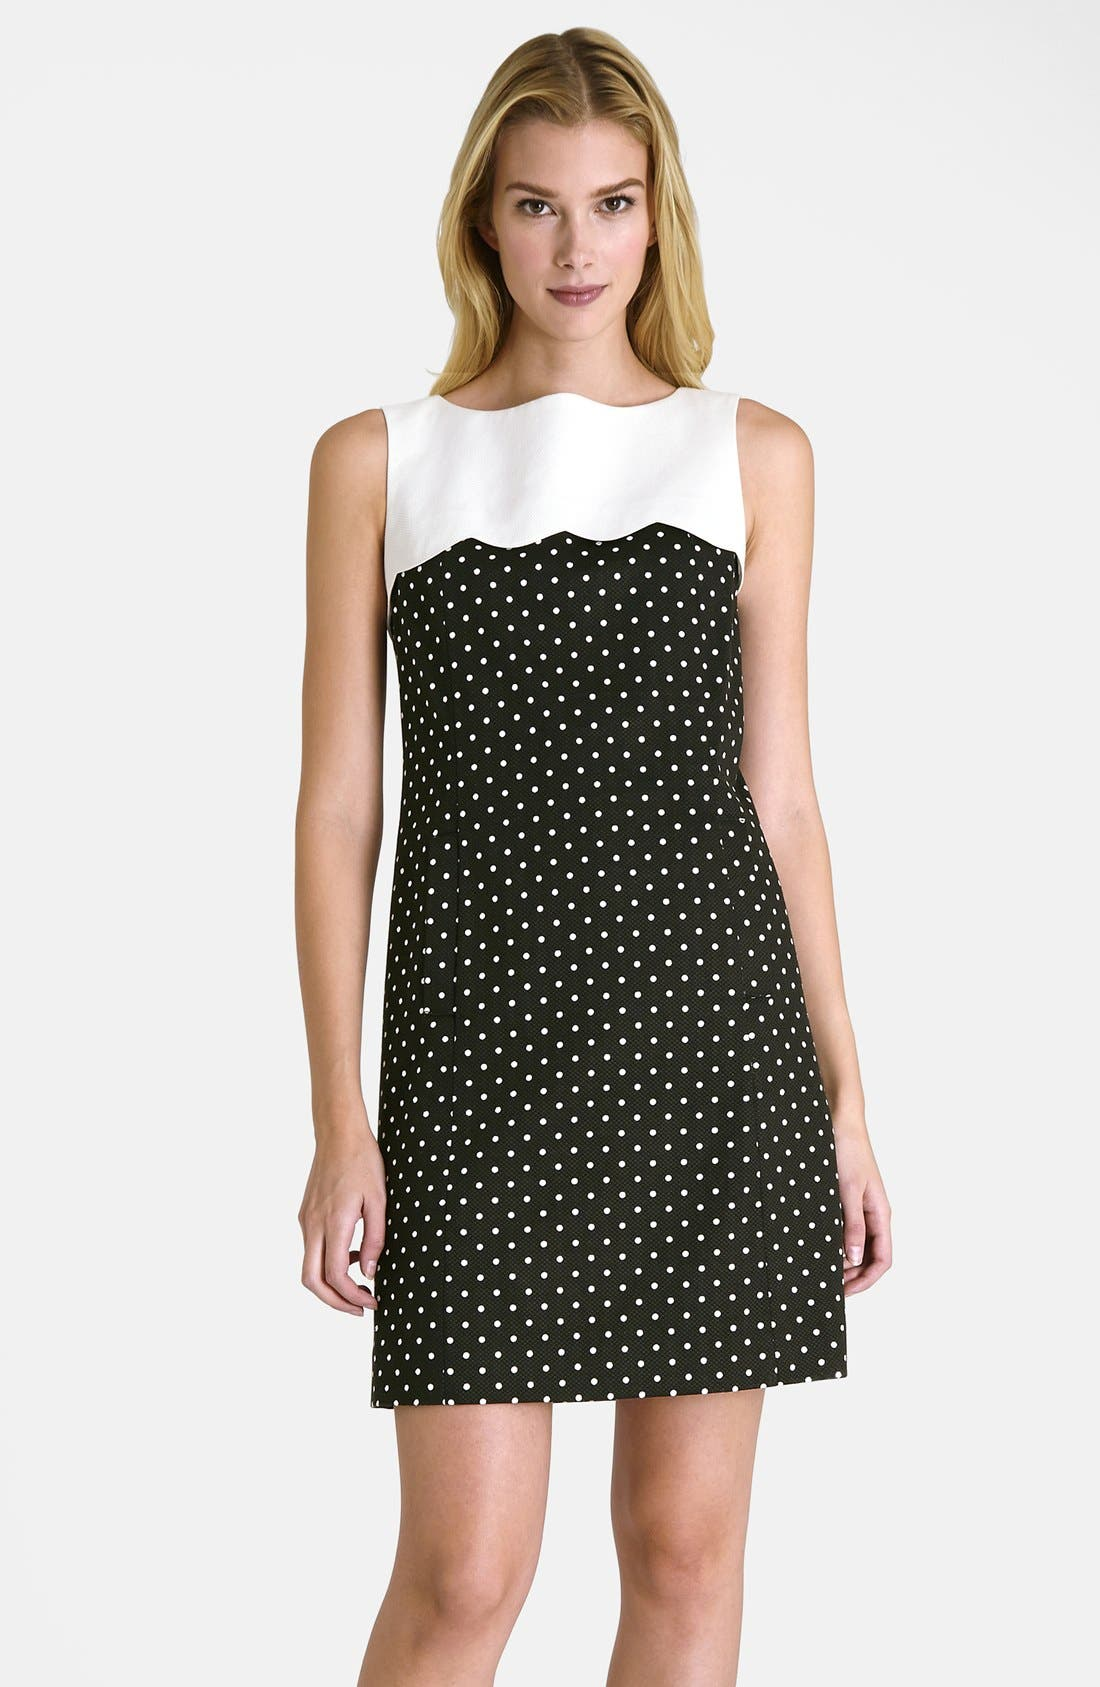 Alternate Image 1 Selected - Tahari Polka Dot Shift Dress (Petite)